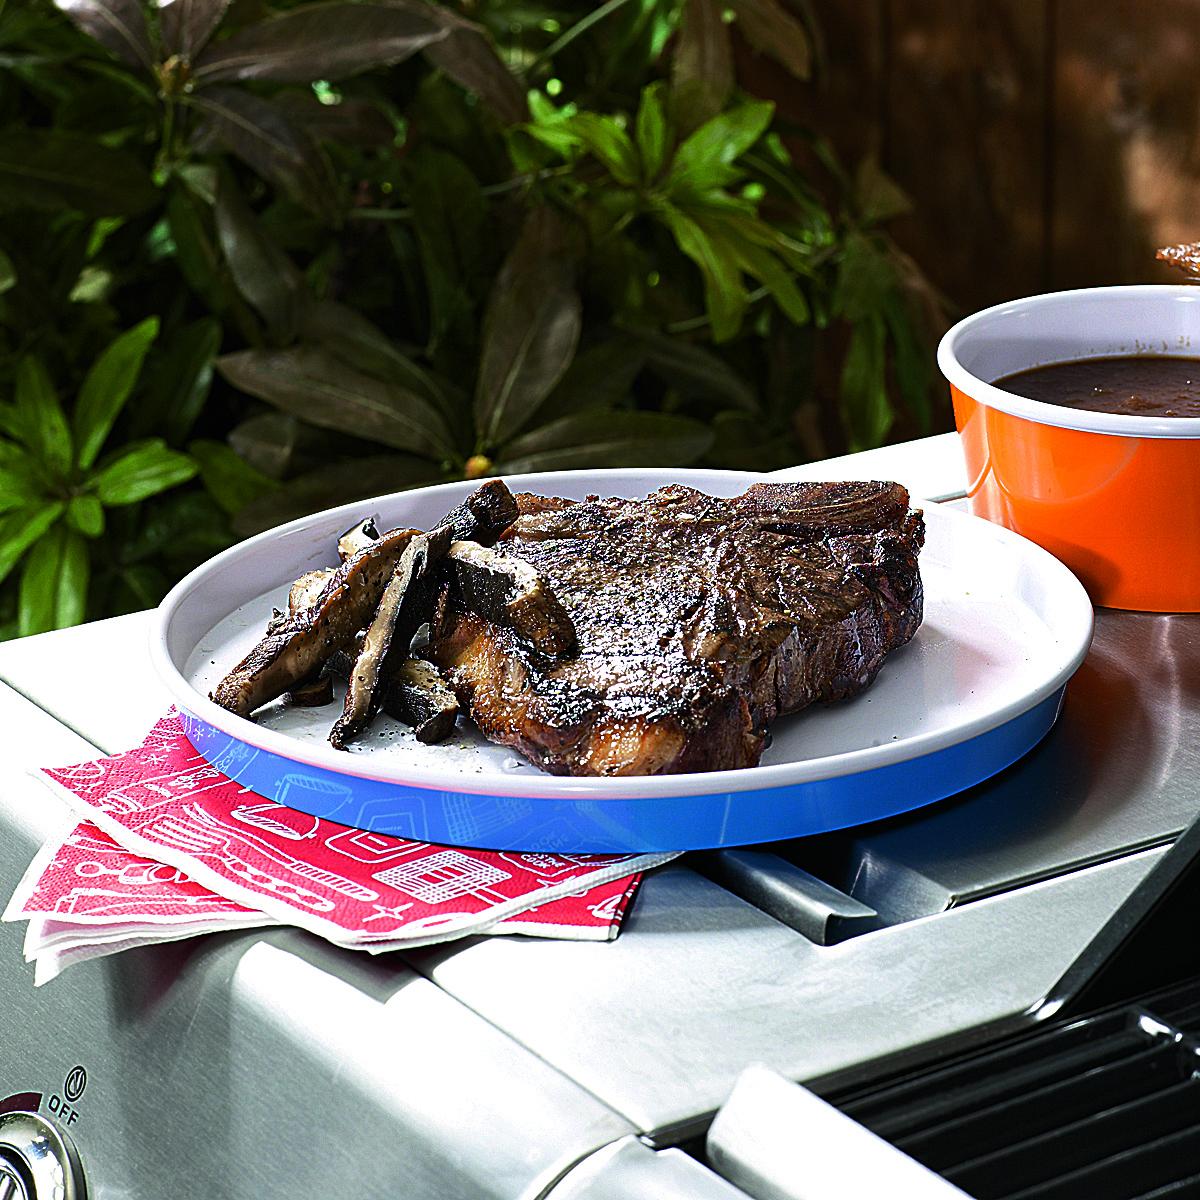 Steak and Portobellos with Steak Sauce